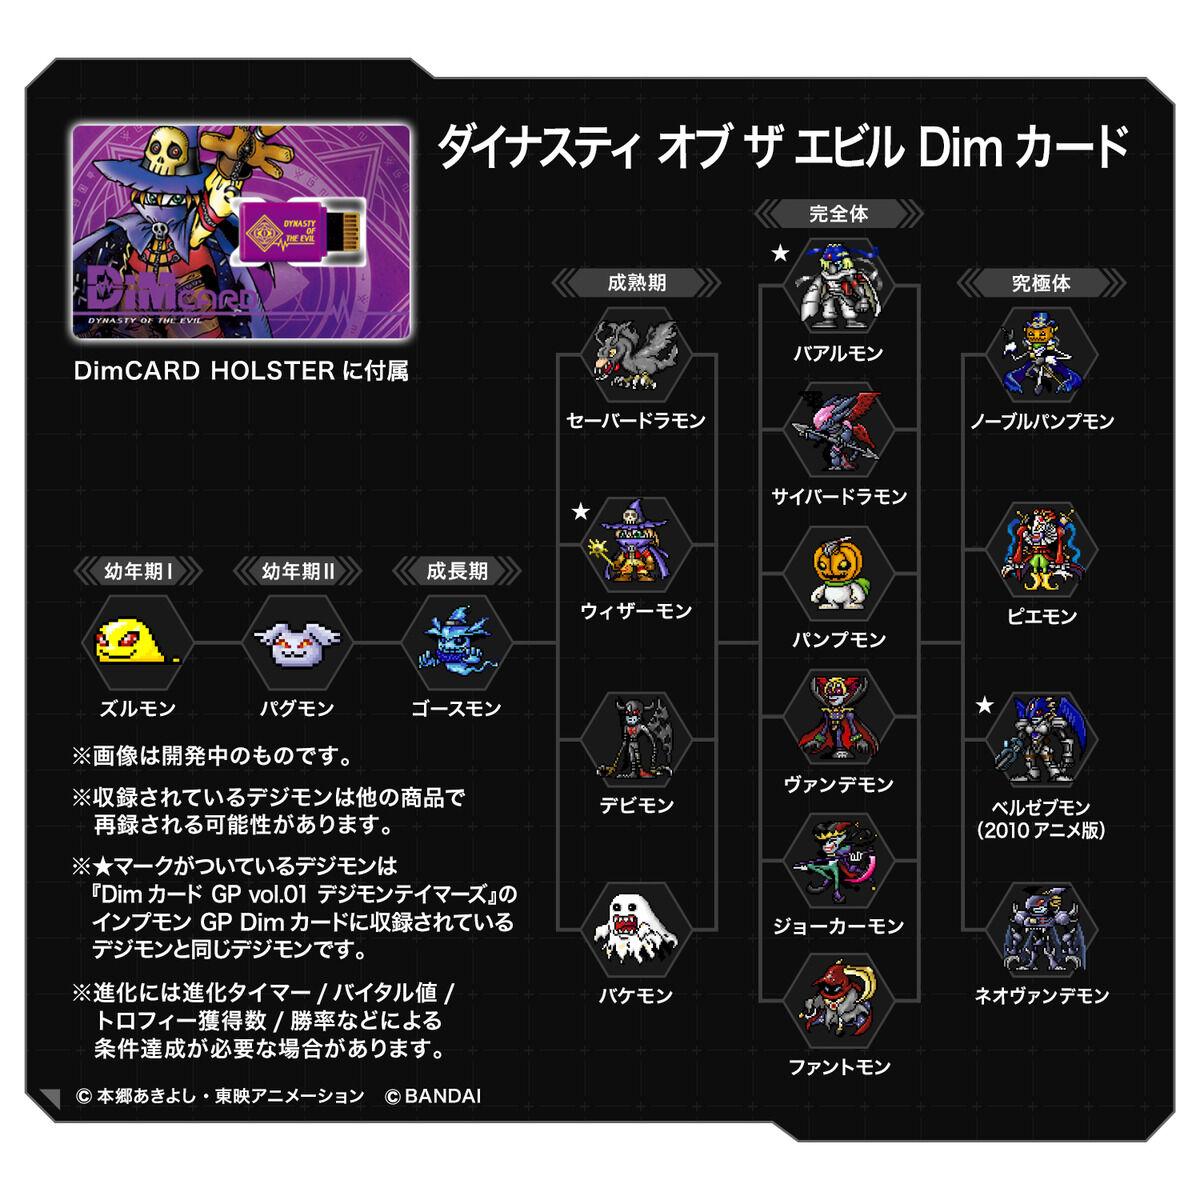 dynastyoftheevil_september1_2021.jpg